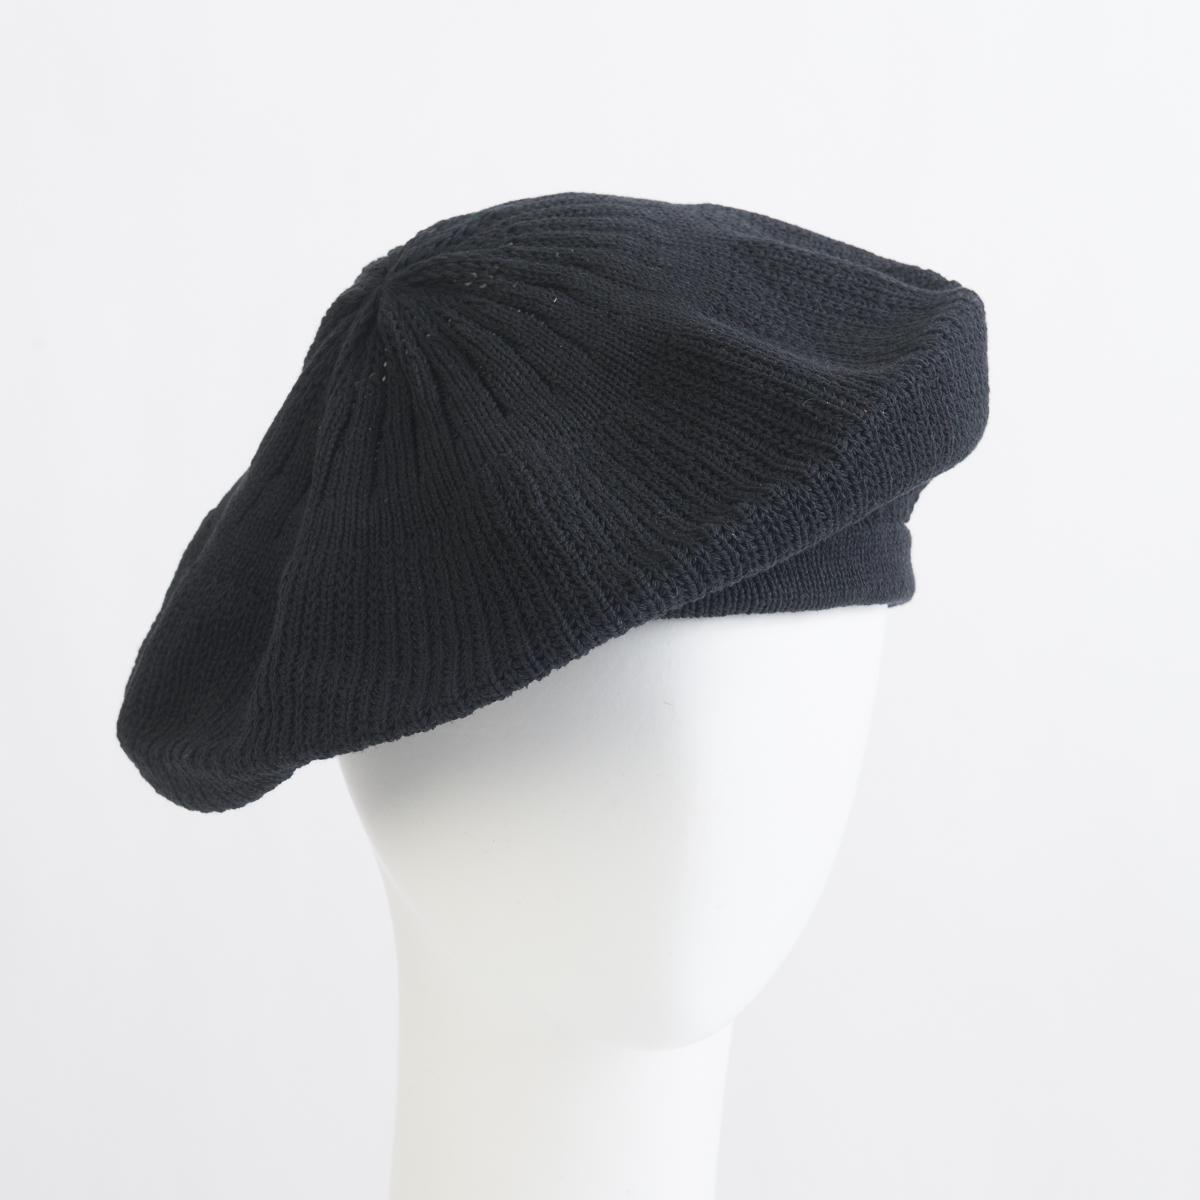 Black Cotton Knitted Beret-771006-BK- Sun Yorkos  0da06468eee